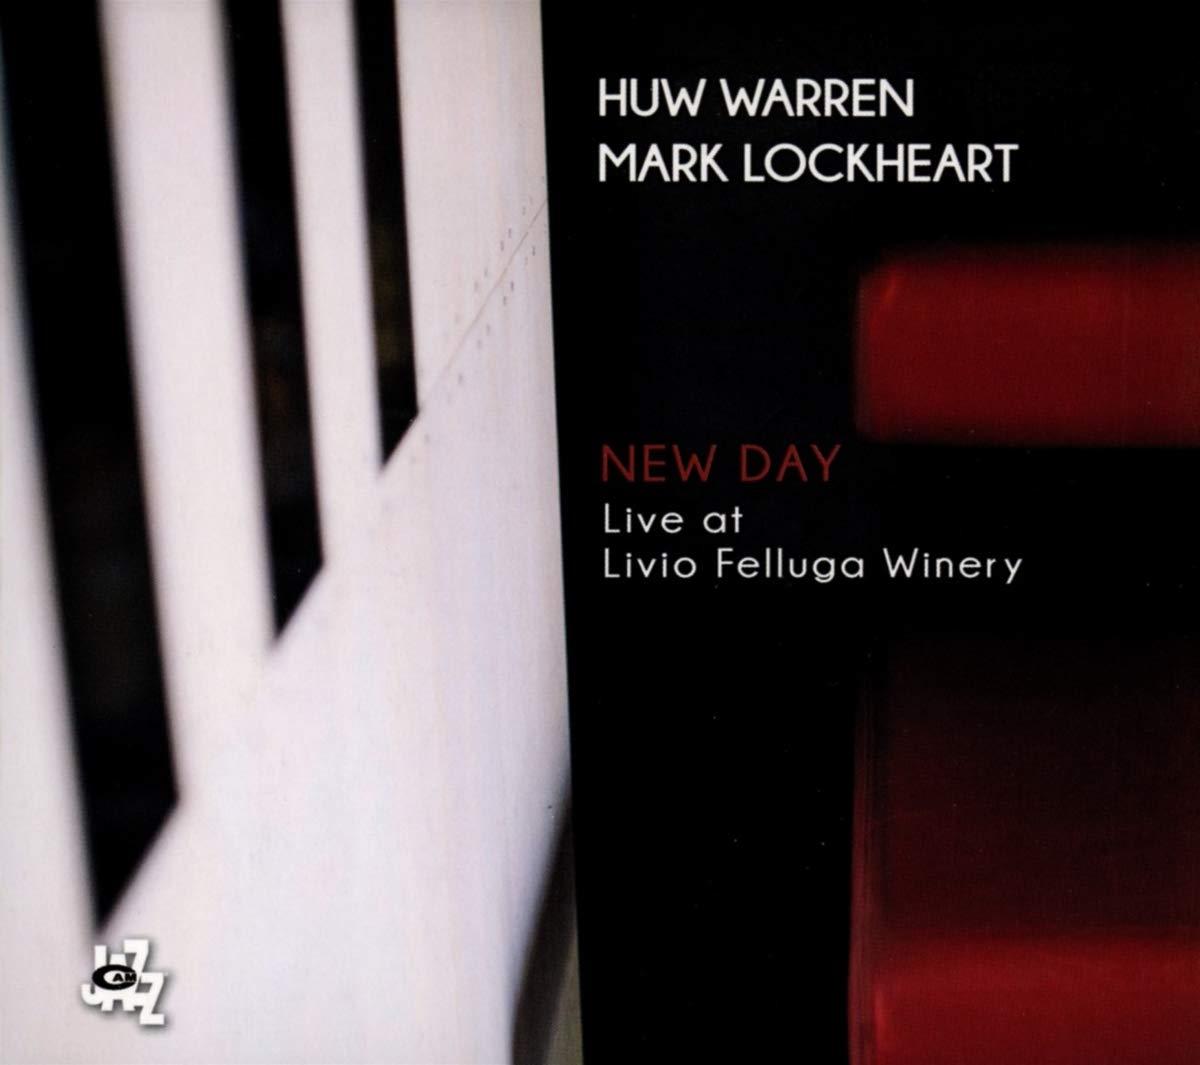 HUW WARREN - Huw Warren / Mark Lockheart : New Day: Live At Livio Felluga Winery cover